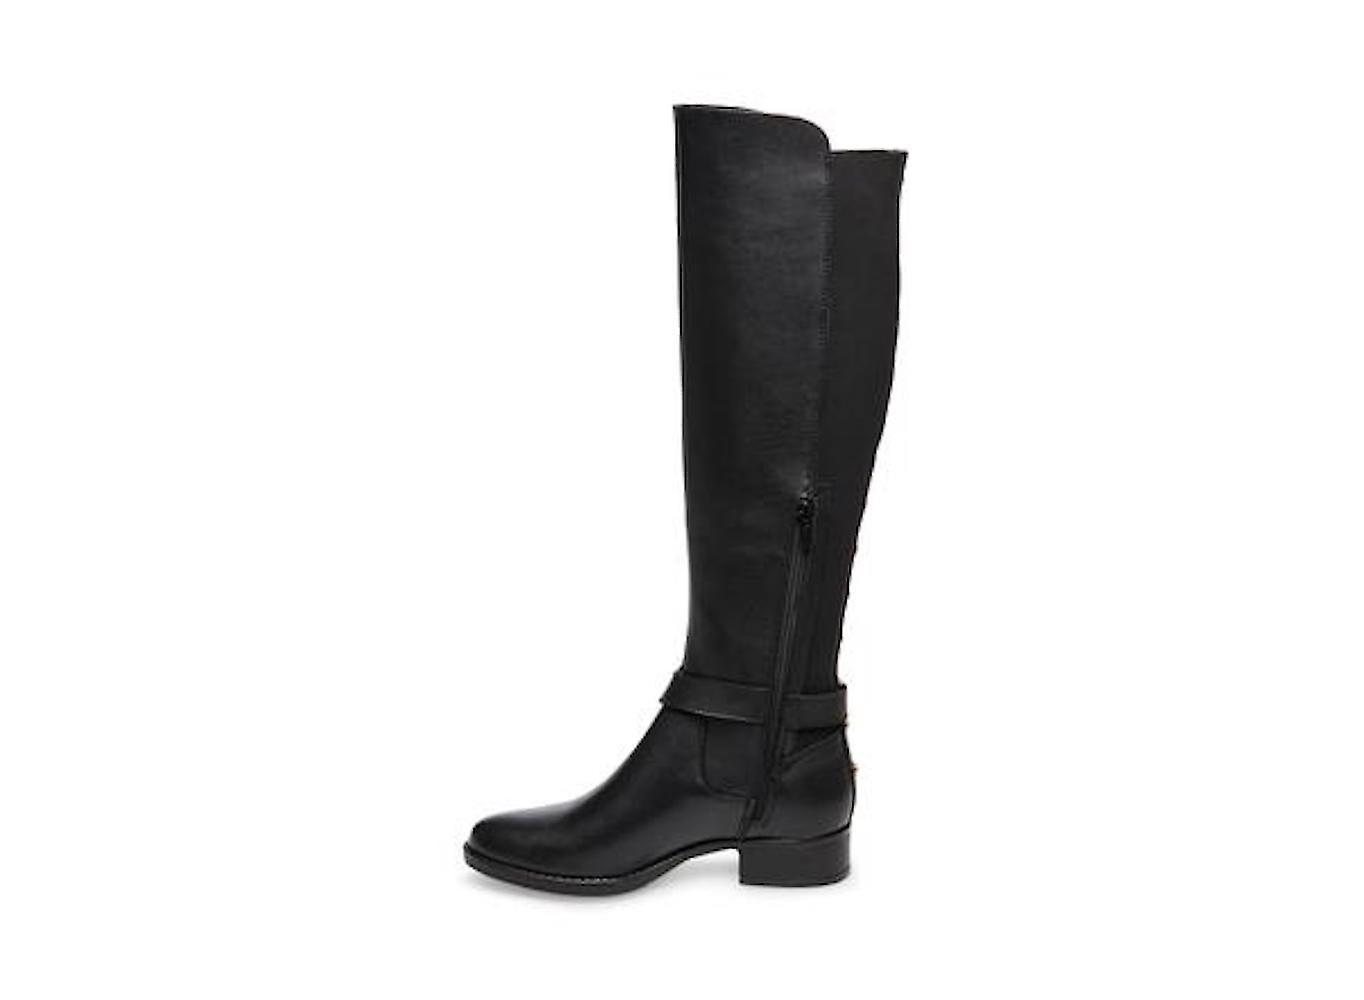 Steve Madden Womens Jadine Leather Almond Toe Knee High Fashion Boots